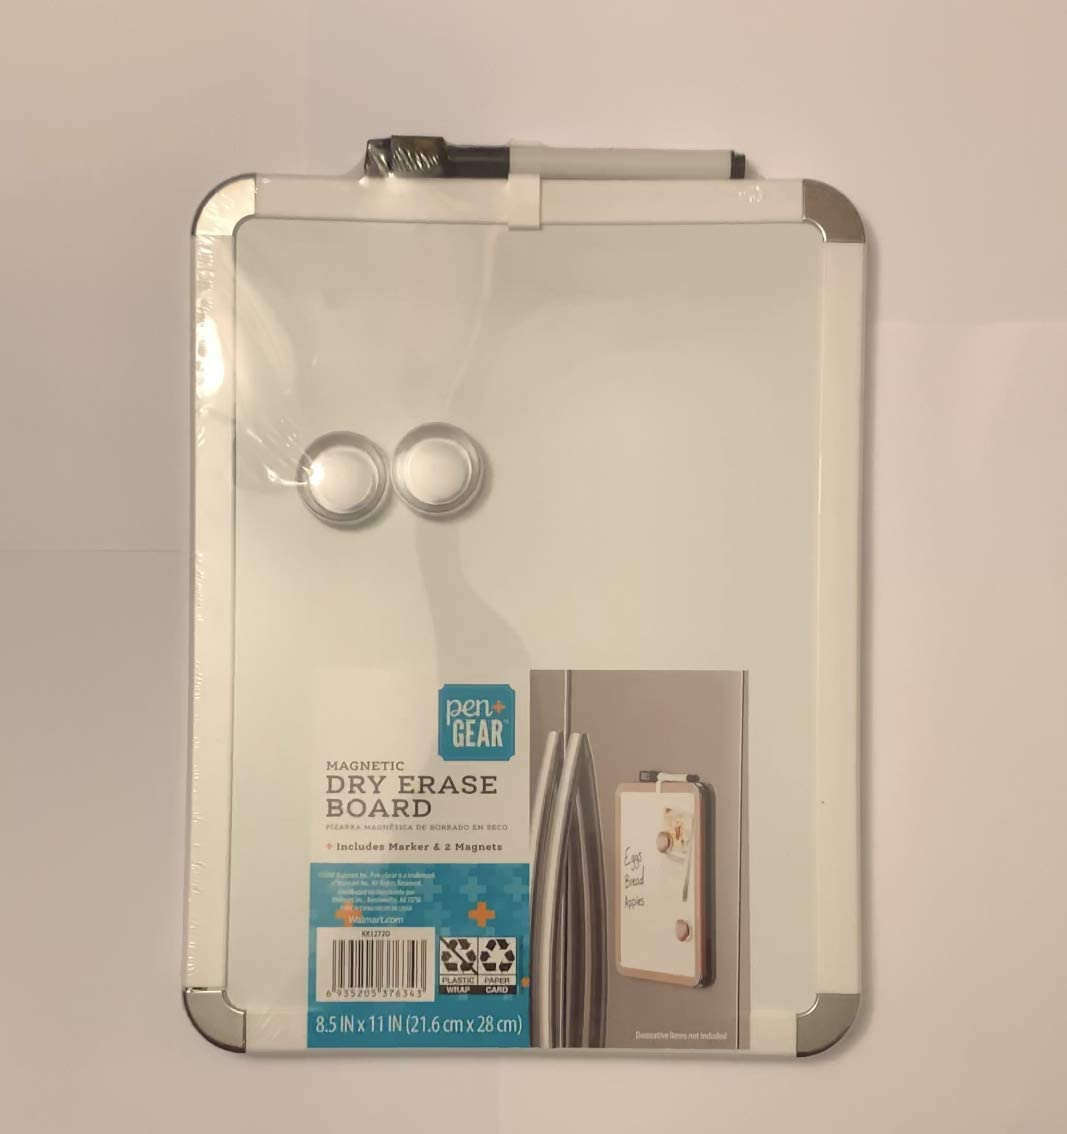 Personal Dry Erase Board (White)